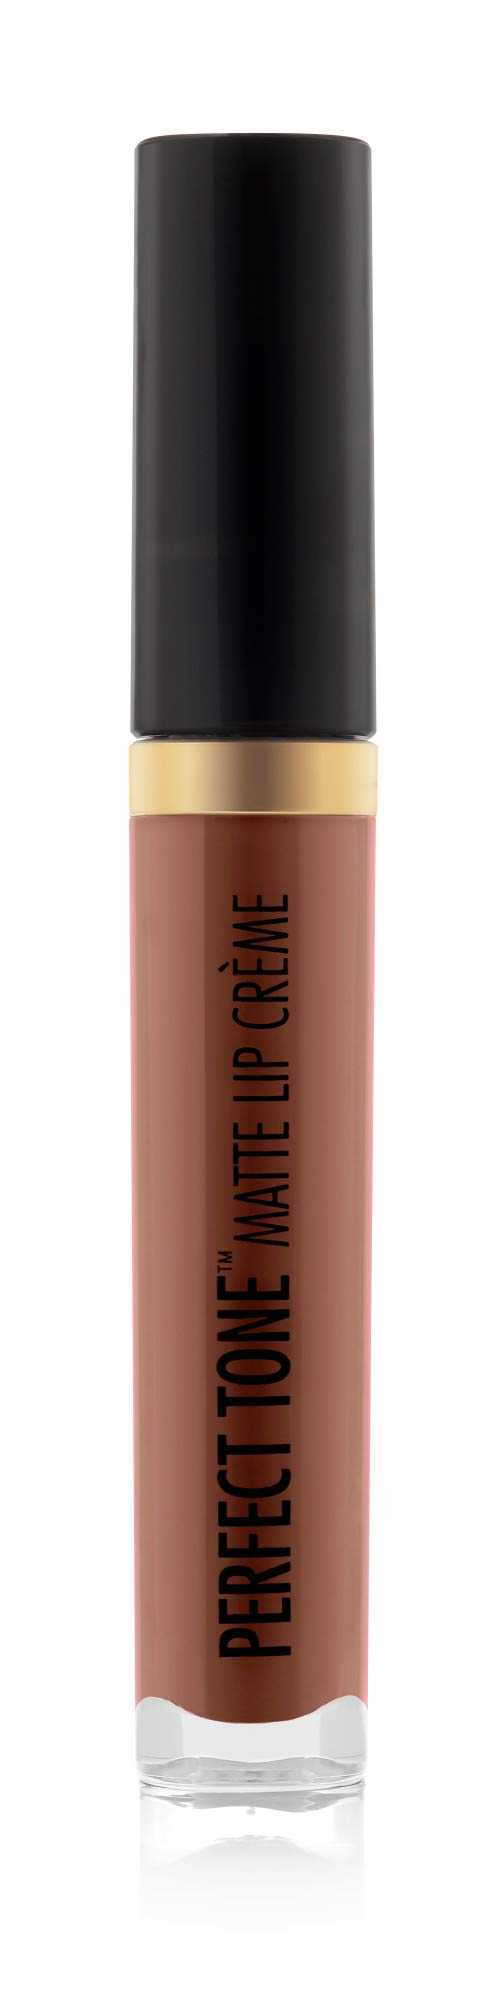 Black Radiance Perfect Tone Matte Lip Crème, Sexy Siren, 1 Tube, 0.17 Ounce